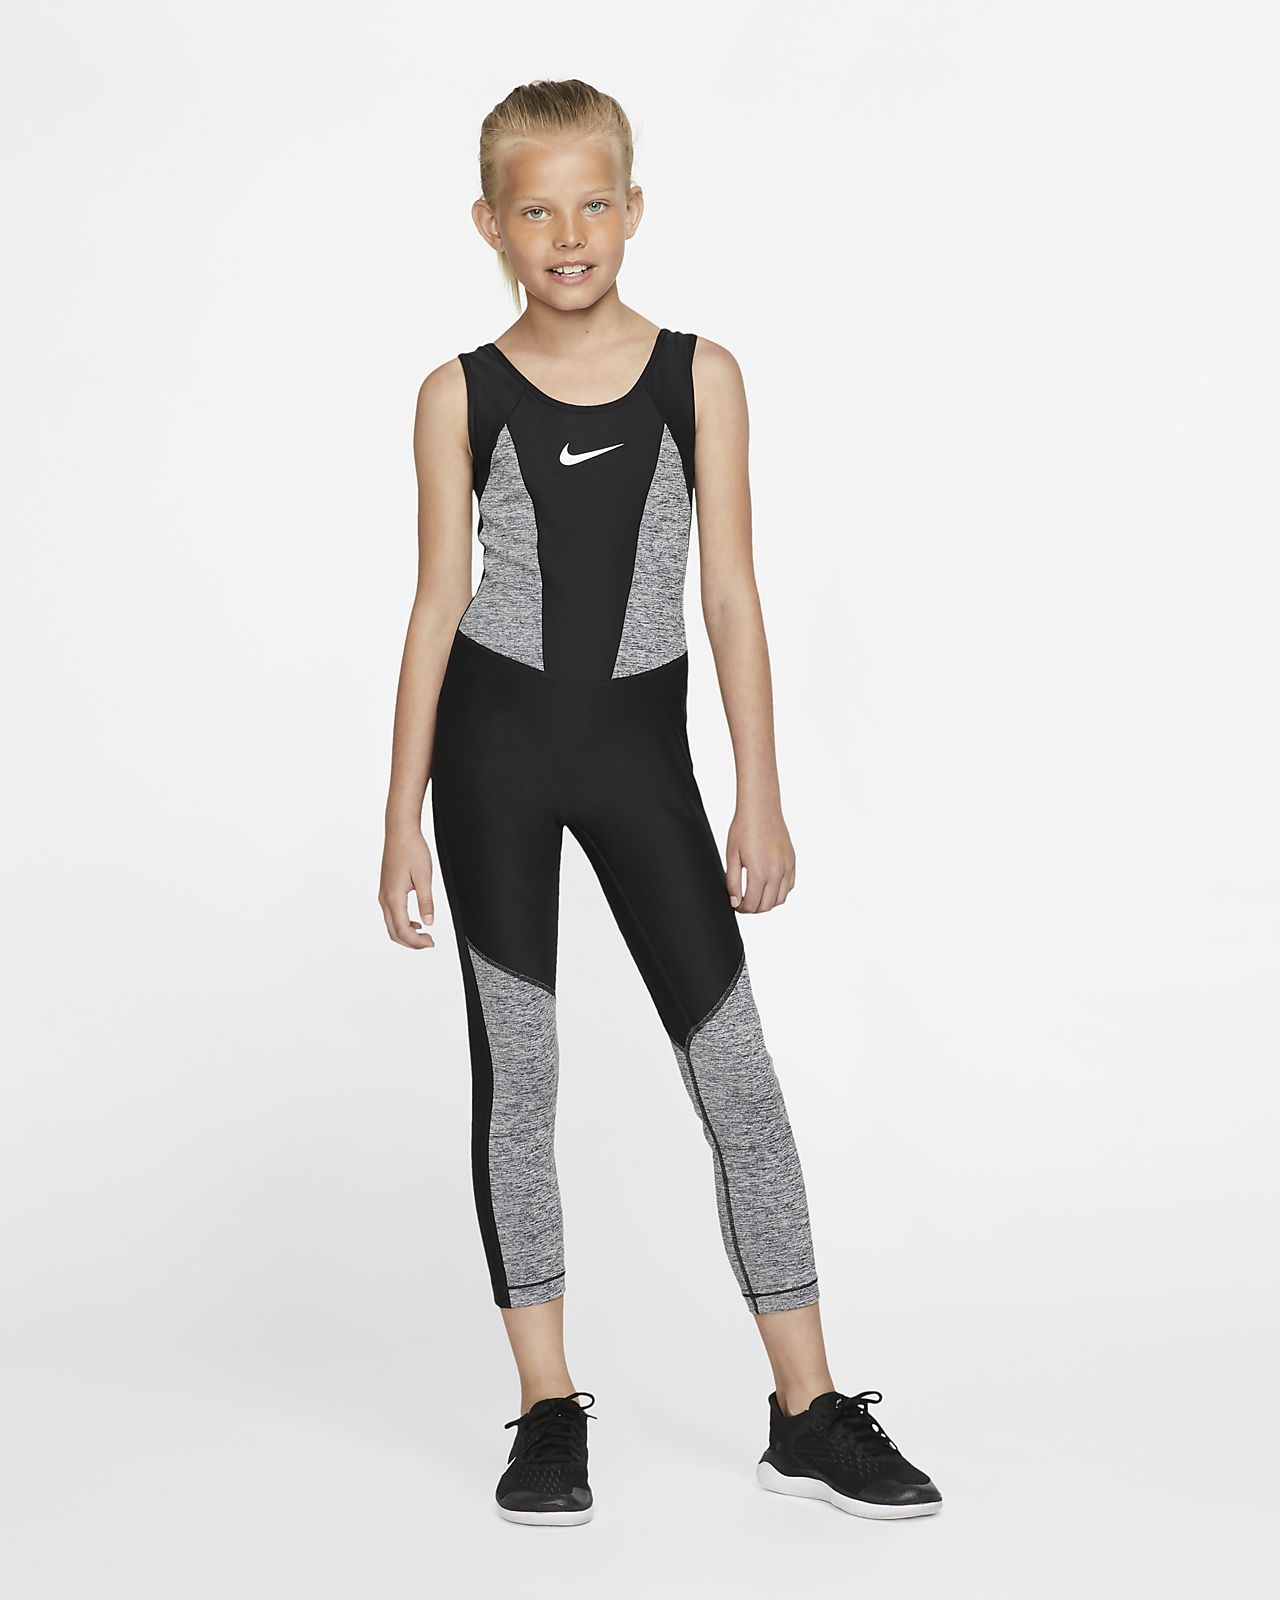 Nike Studio Trainings-Bodysuit für ältere Kinder (Mädchen)